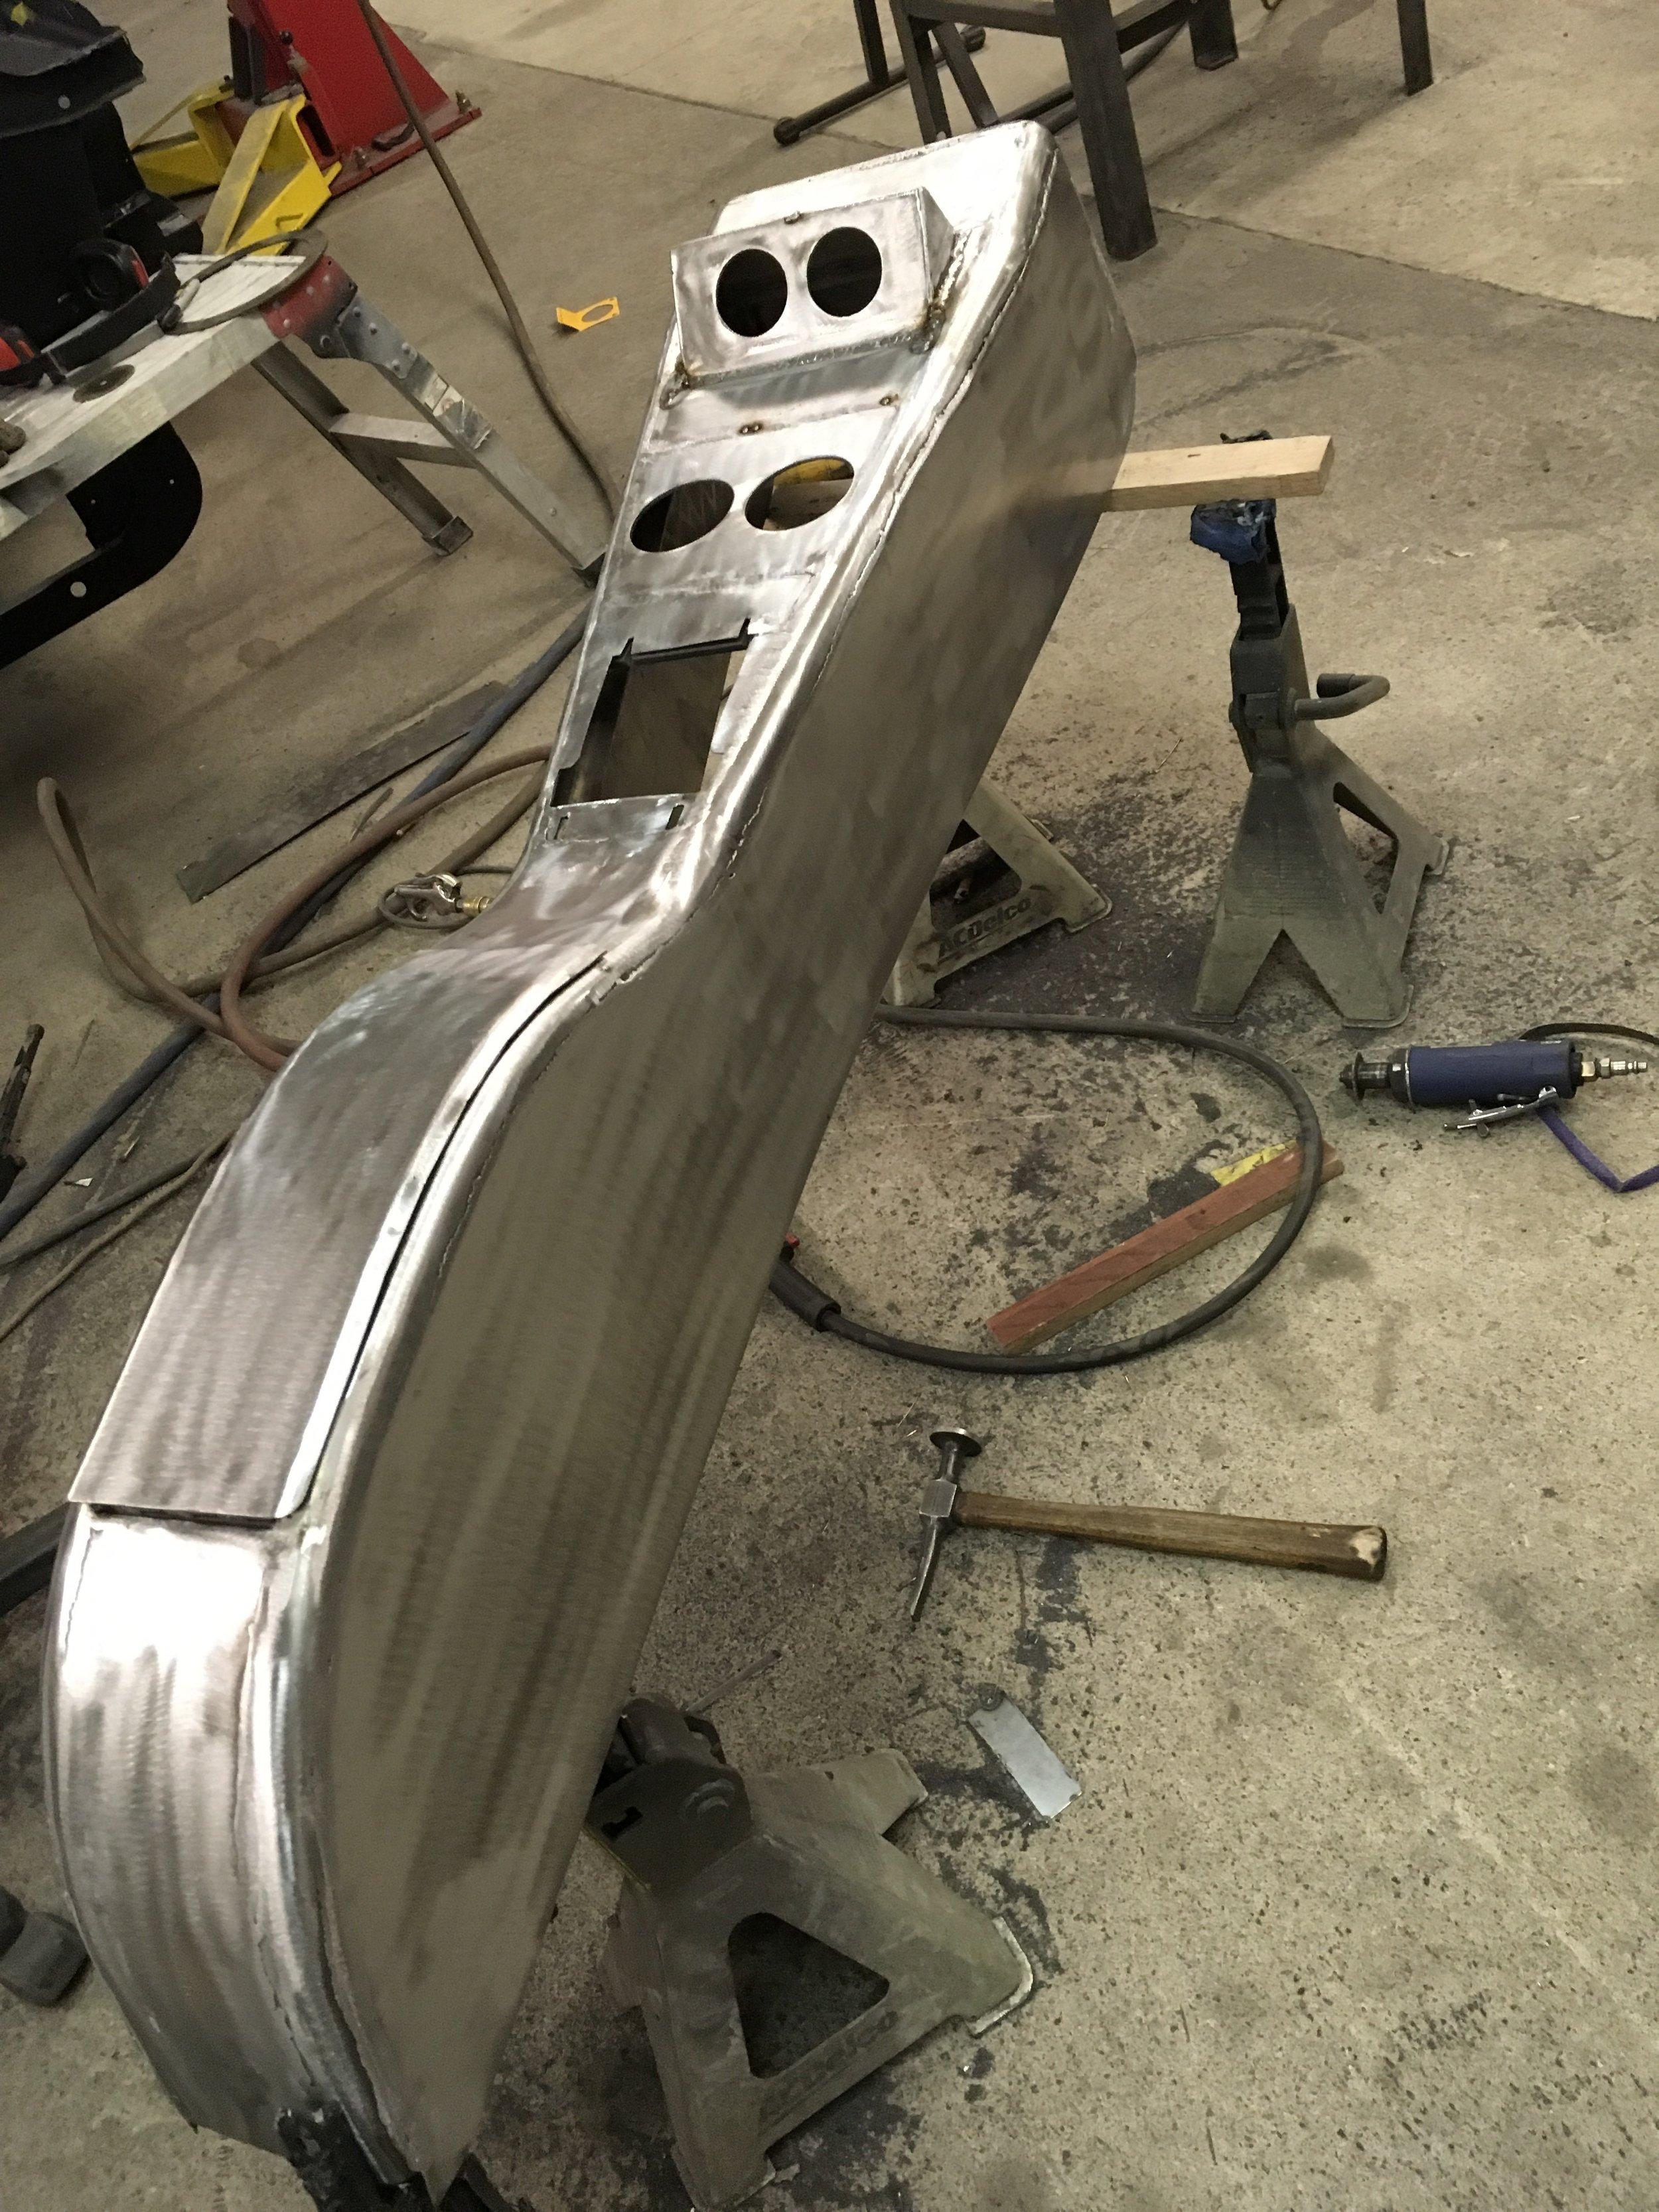 1965-442-minnesota-muscle-car-restoration-hot-rod-factory.jpg